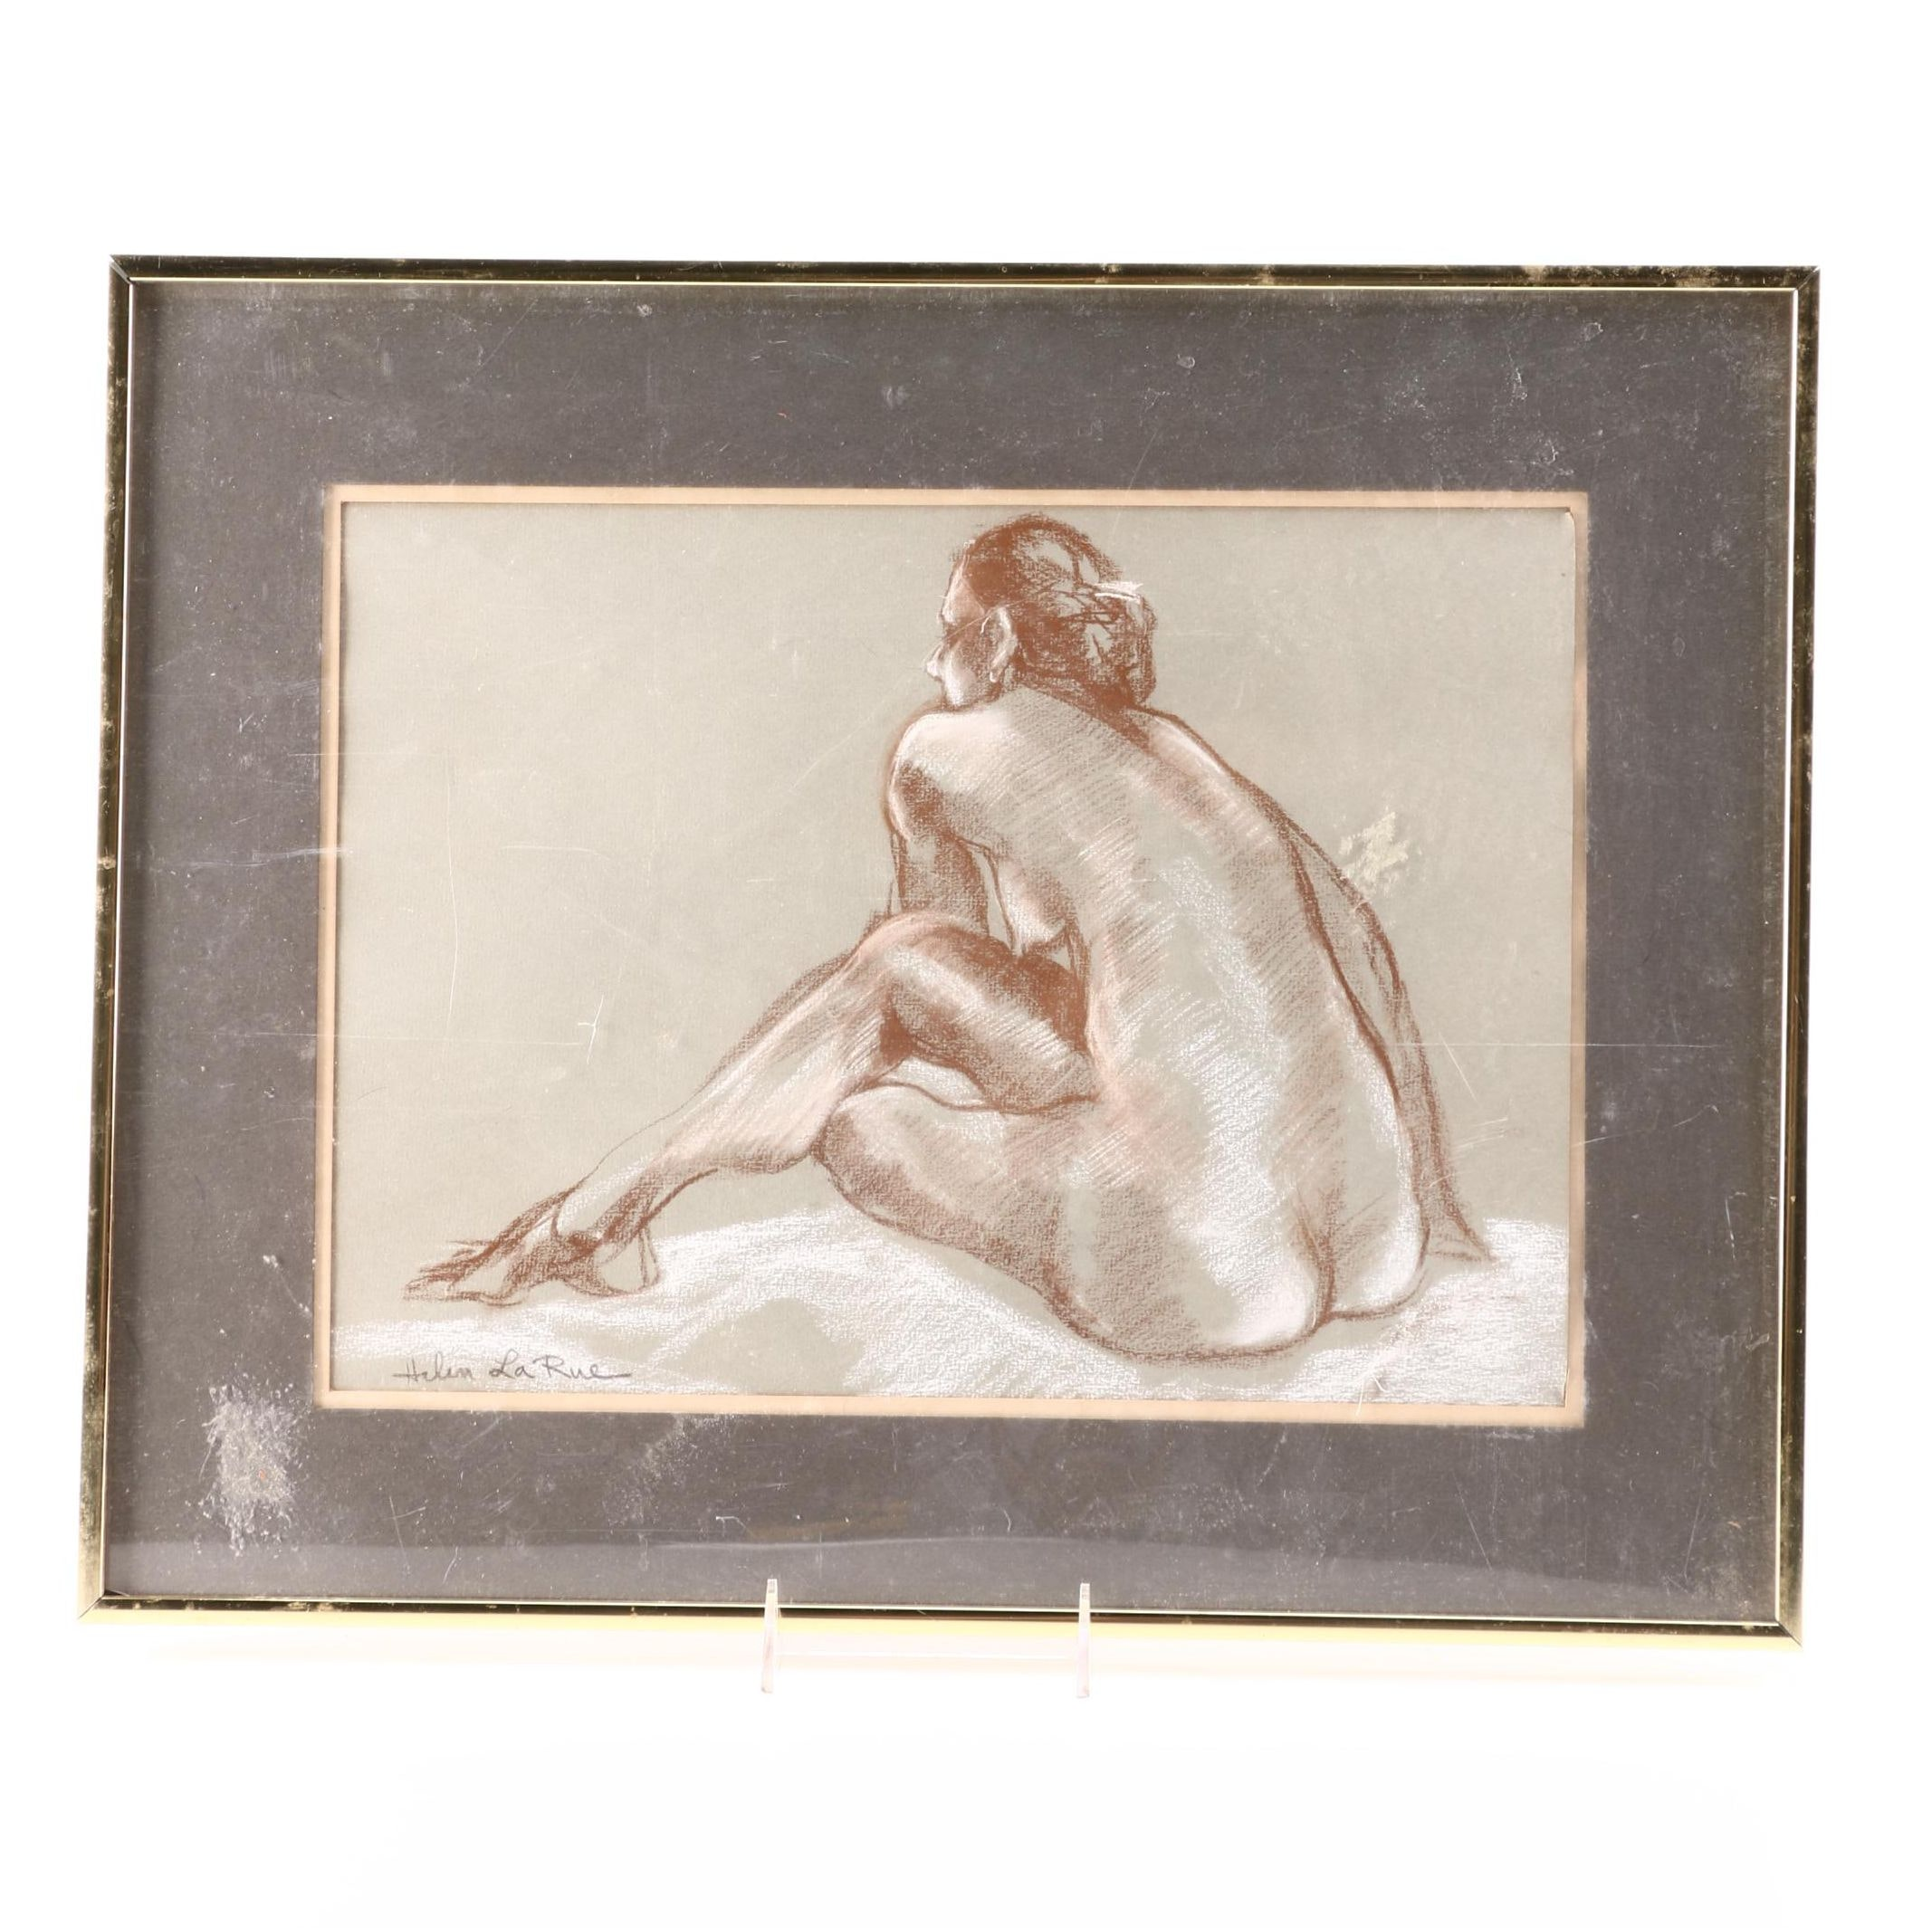 Signed Pastel Nude Drawing by Helen La Rue